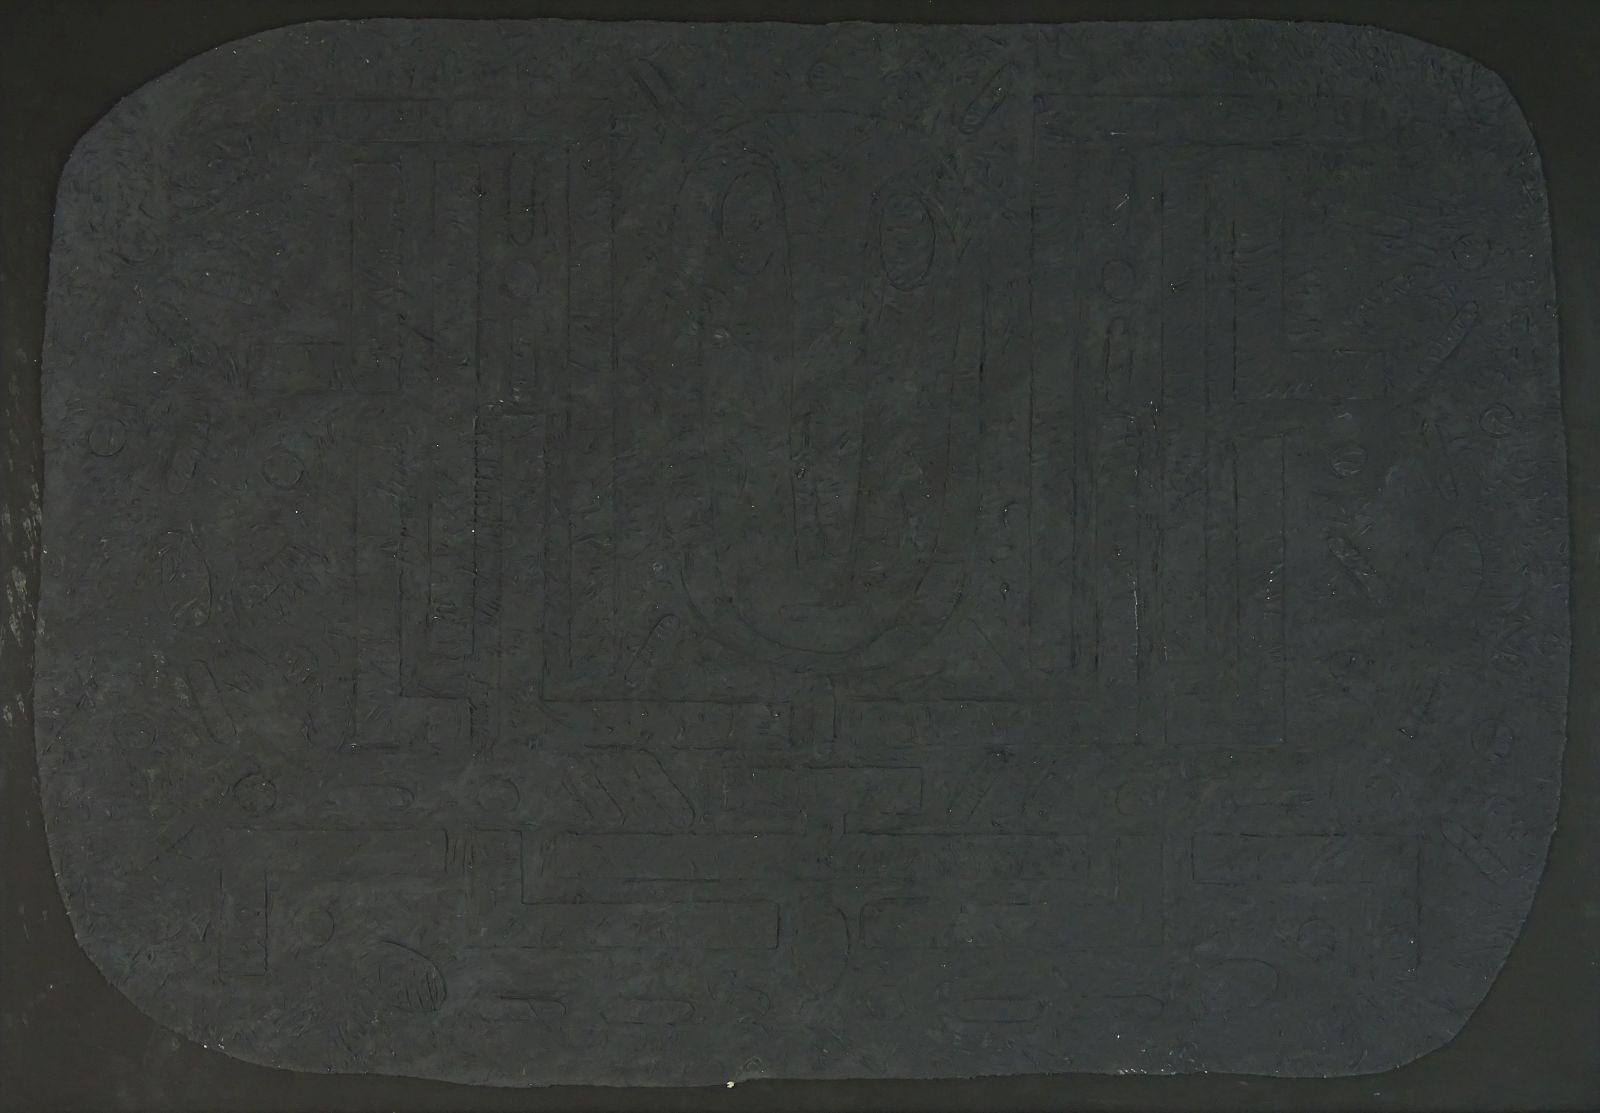 DSC09309.JPG (1600×1113)